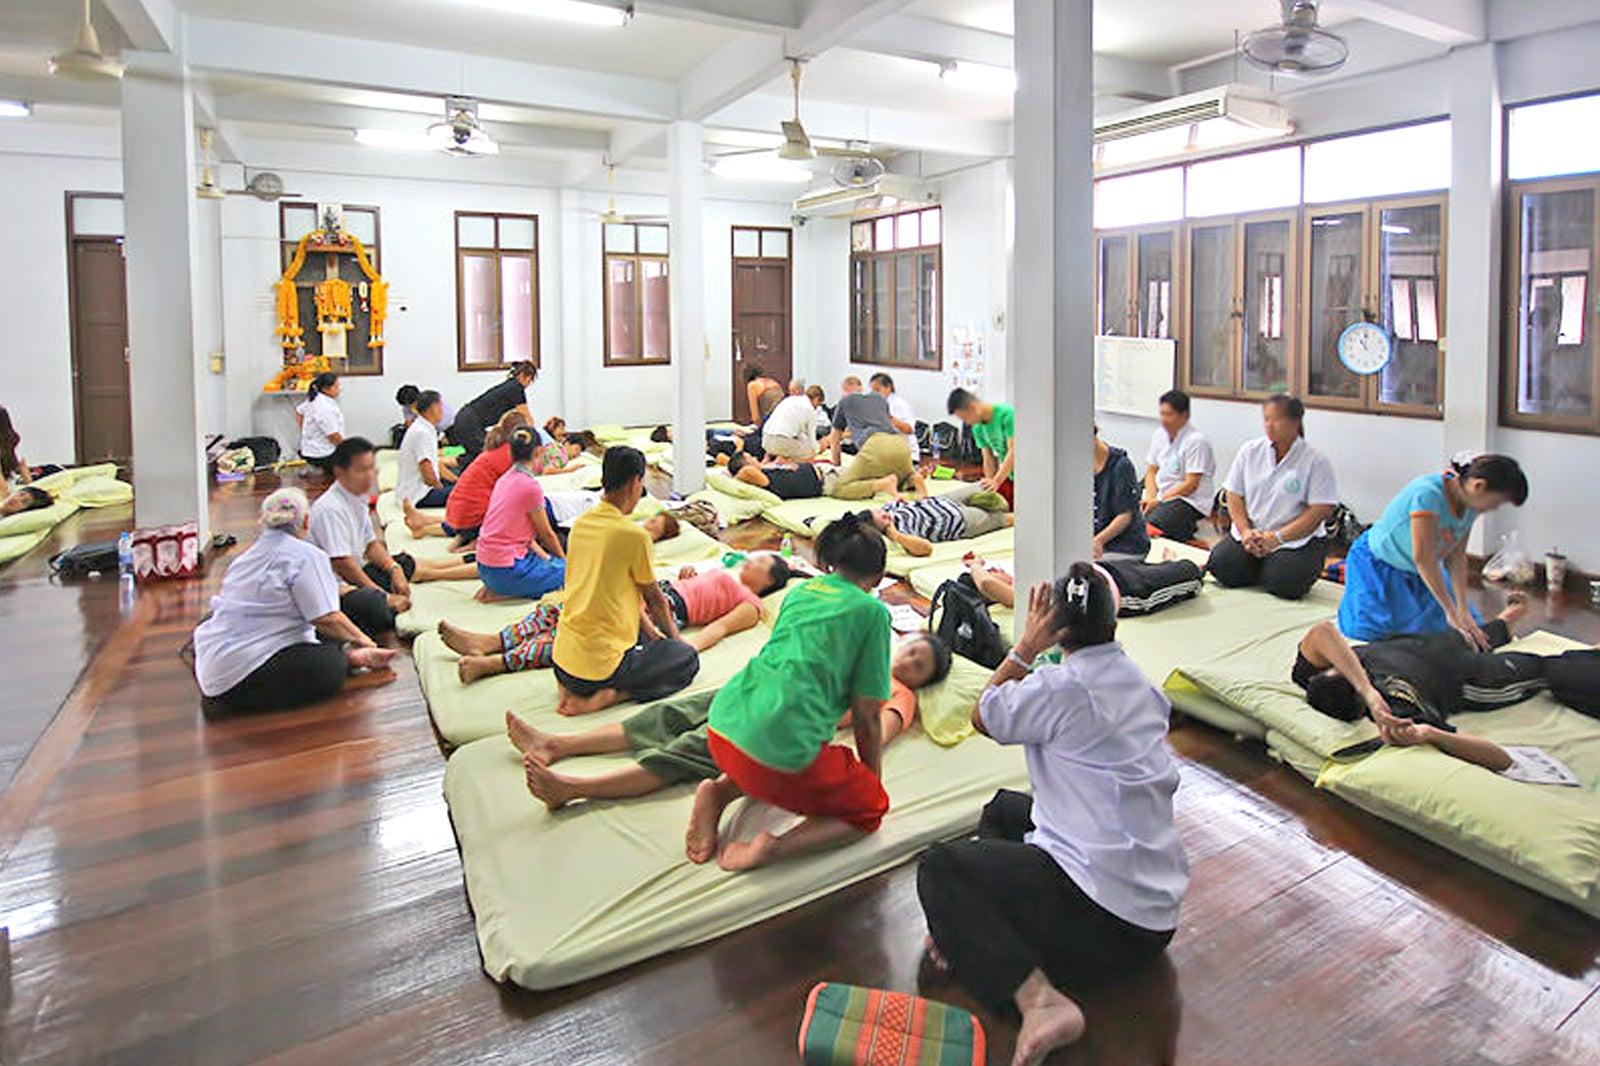 Chetawan Wat Pho Thai Massage School - Learn Traditional Massage in Bangkok  – Go Guides